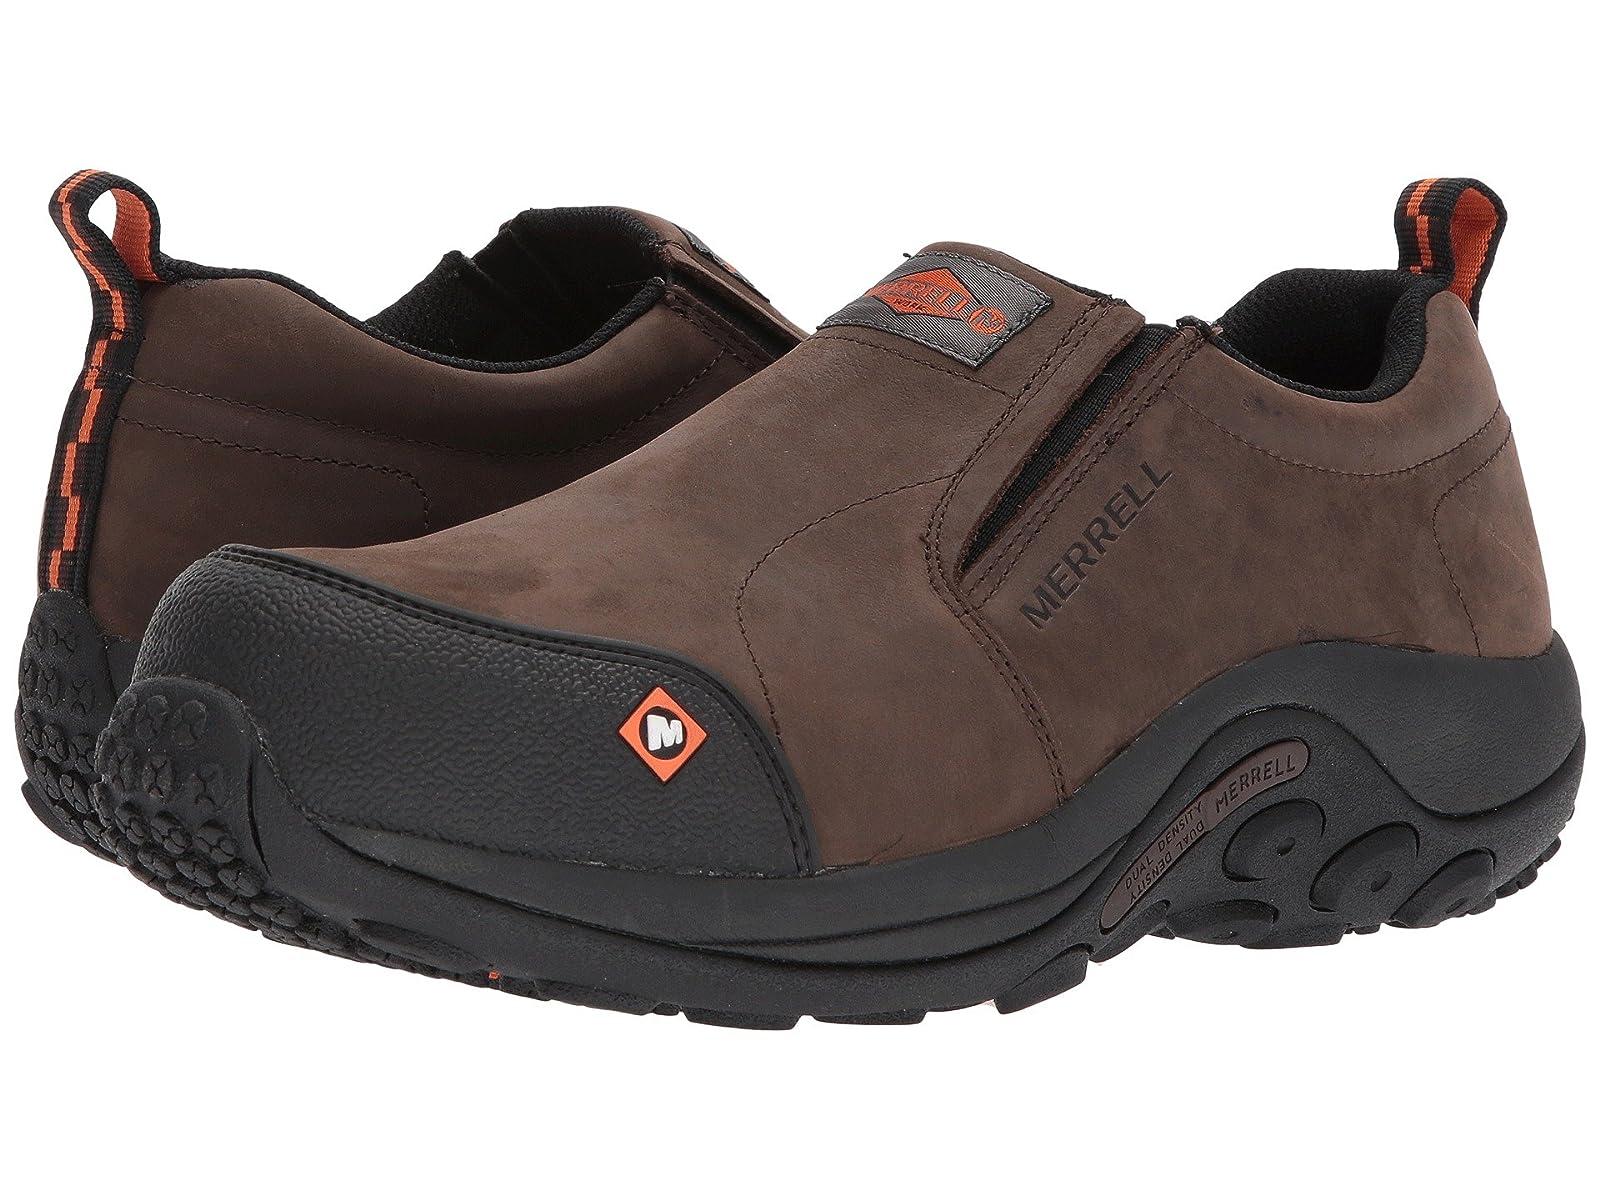 Merrell Work Jungle Moc CTAtmospheric grades have affordable shoes